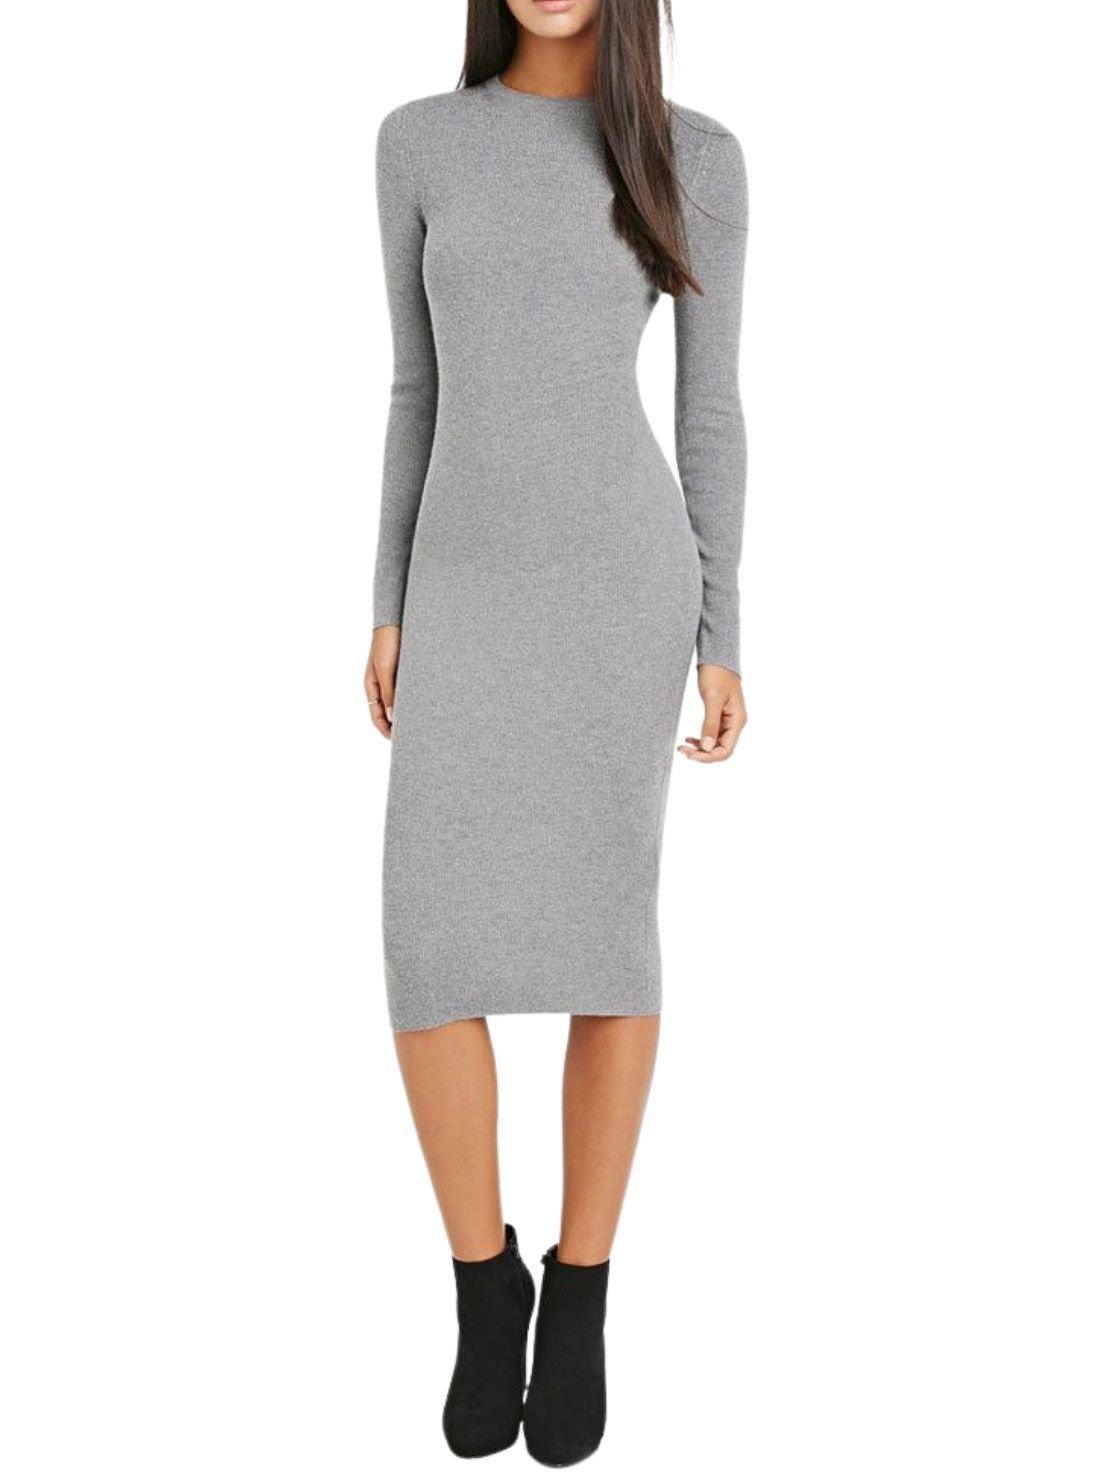 Wholesale Bodycon Sweater Dresses